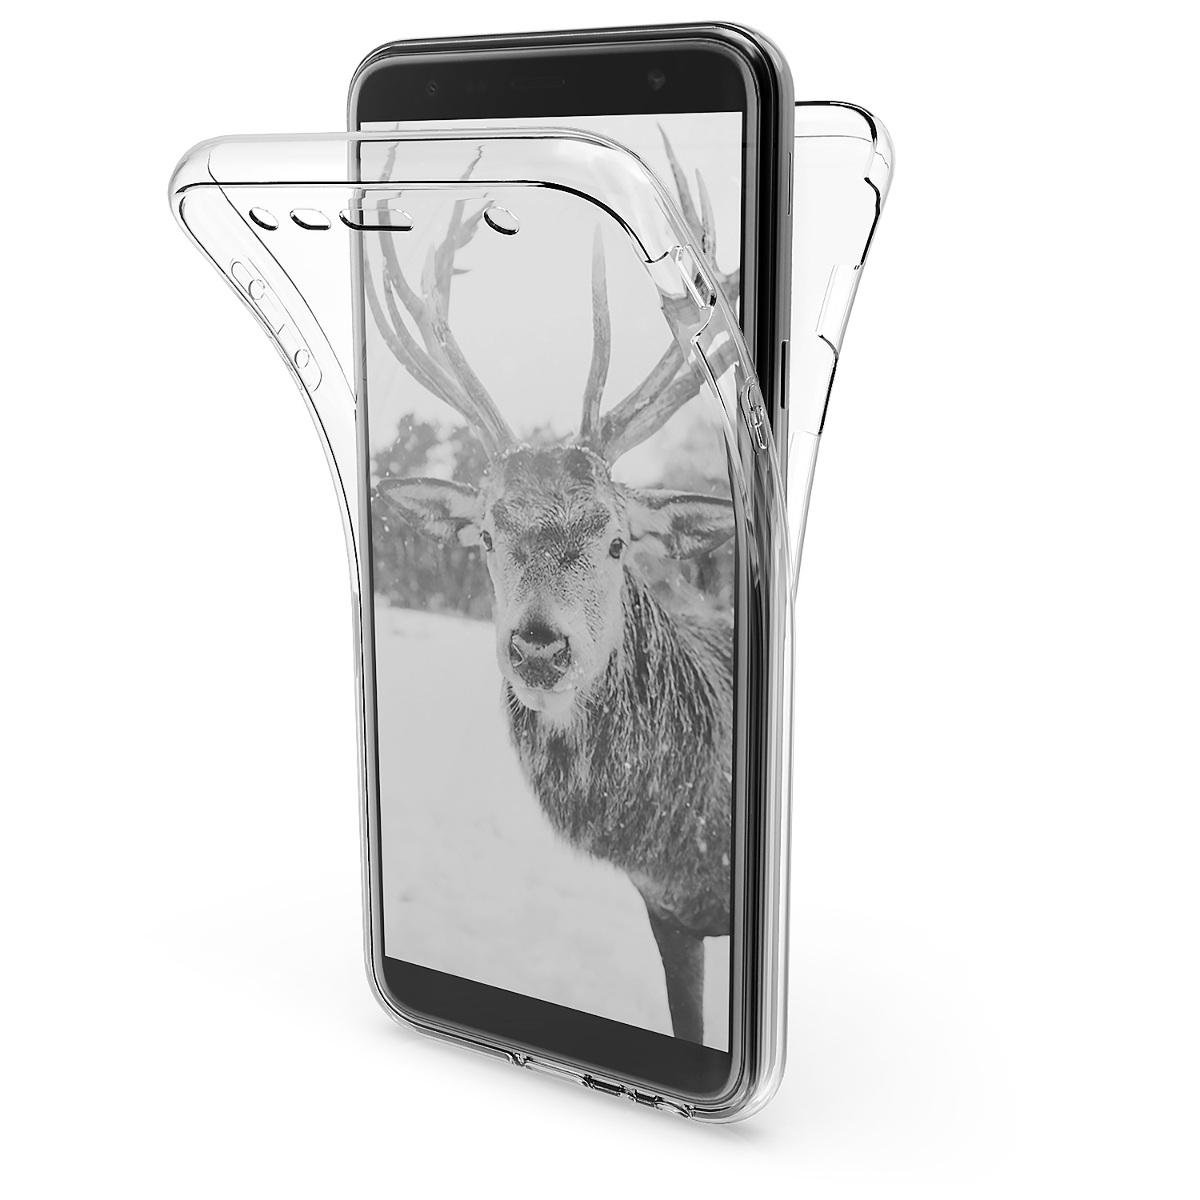 KW Θήκη Σιλικόνης Full Body Samsung Galaxy J4+ / J4 Plus DUOS  - Transparent (46432.03)